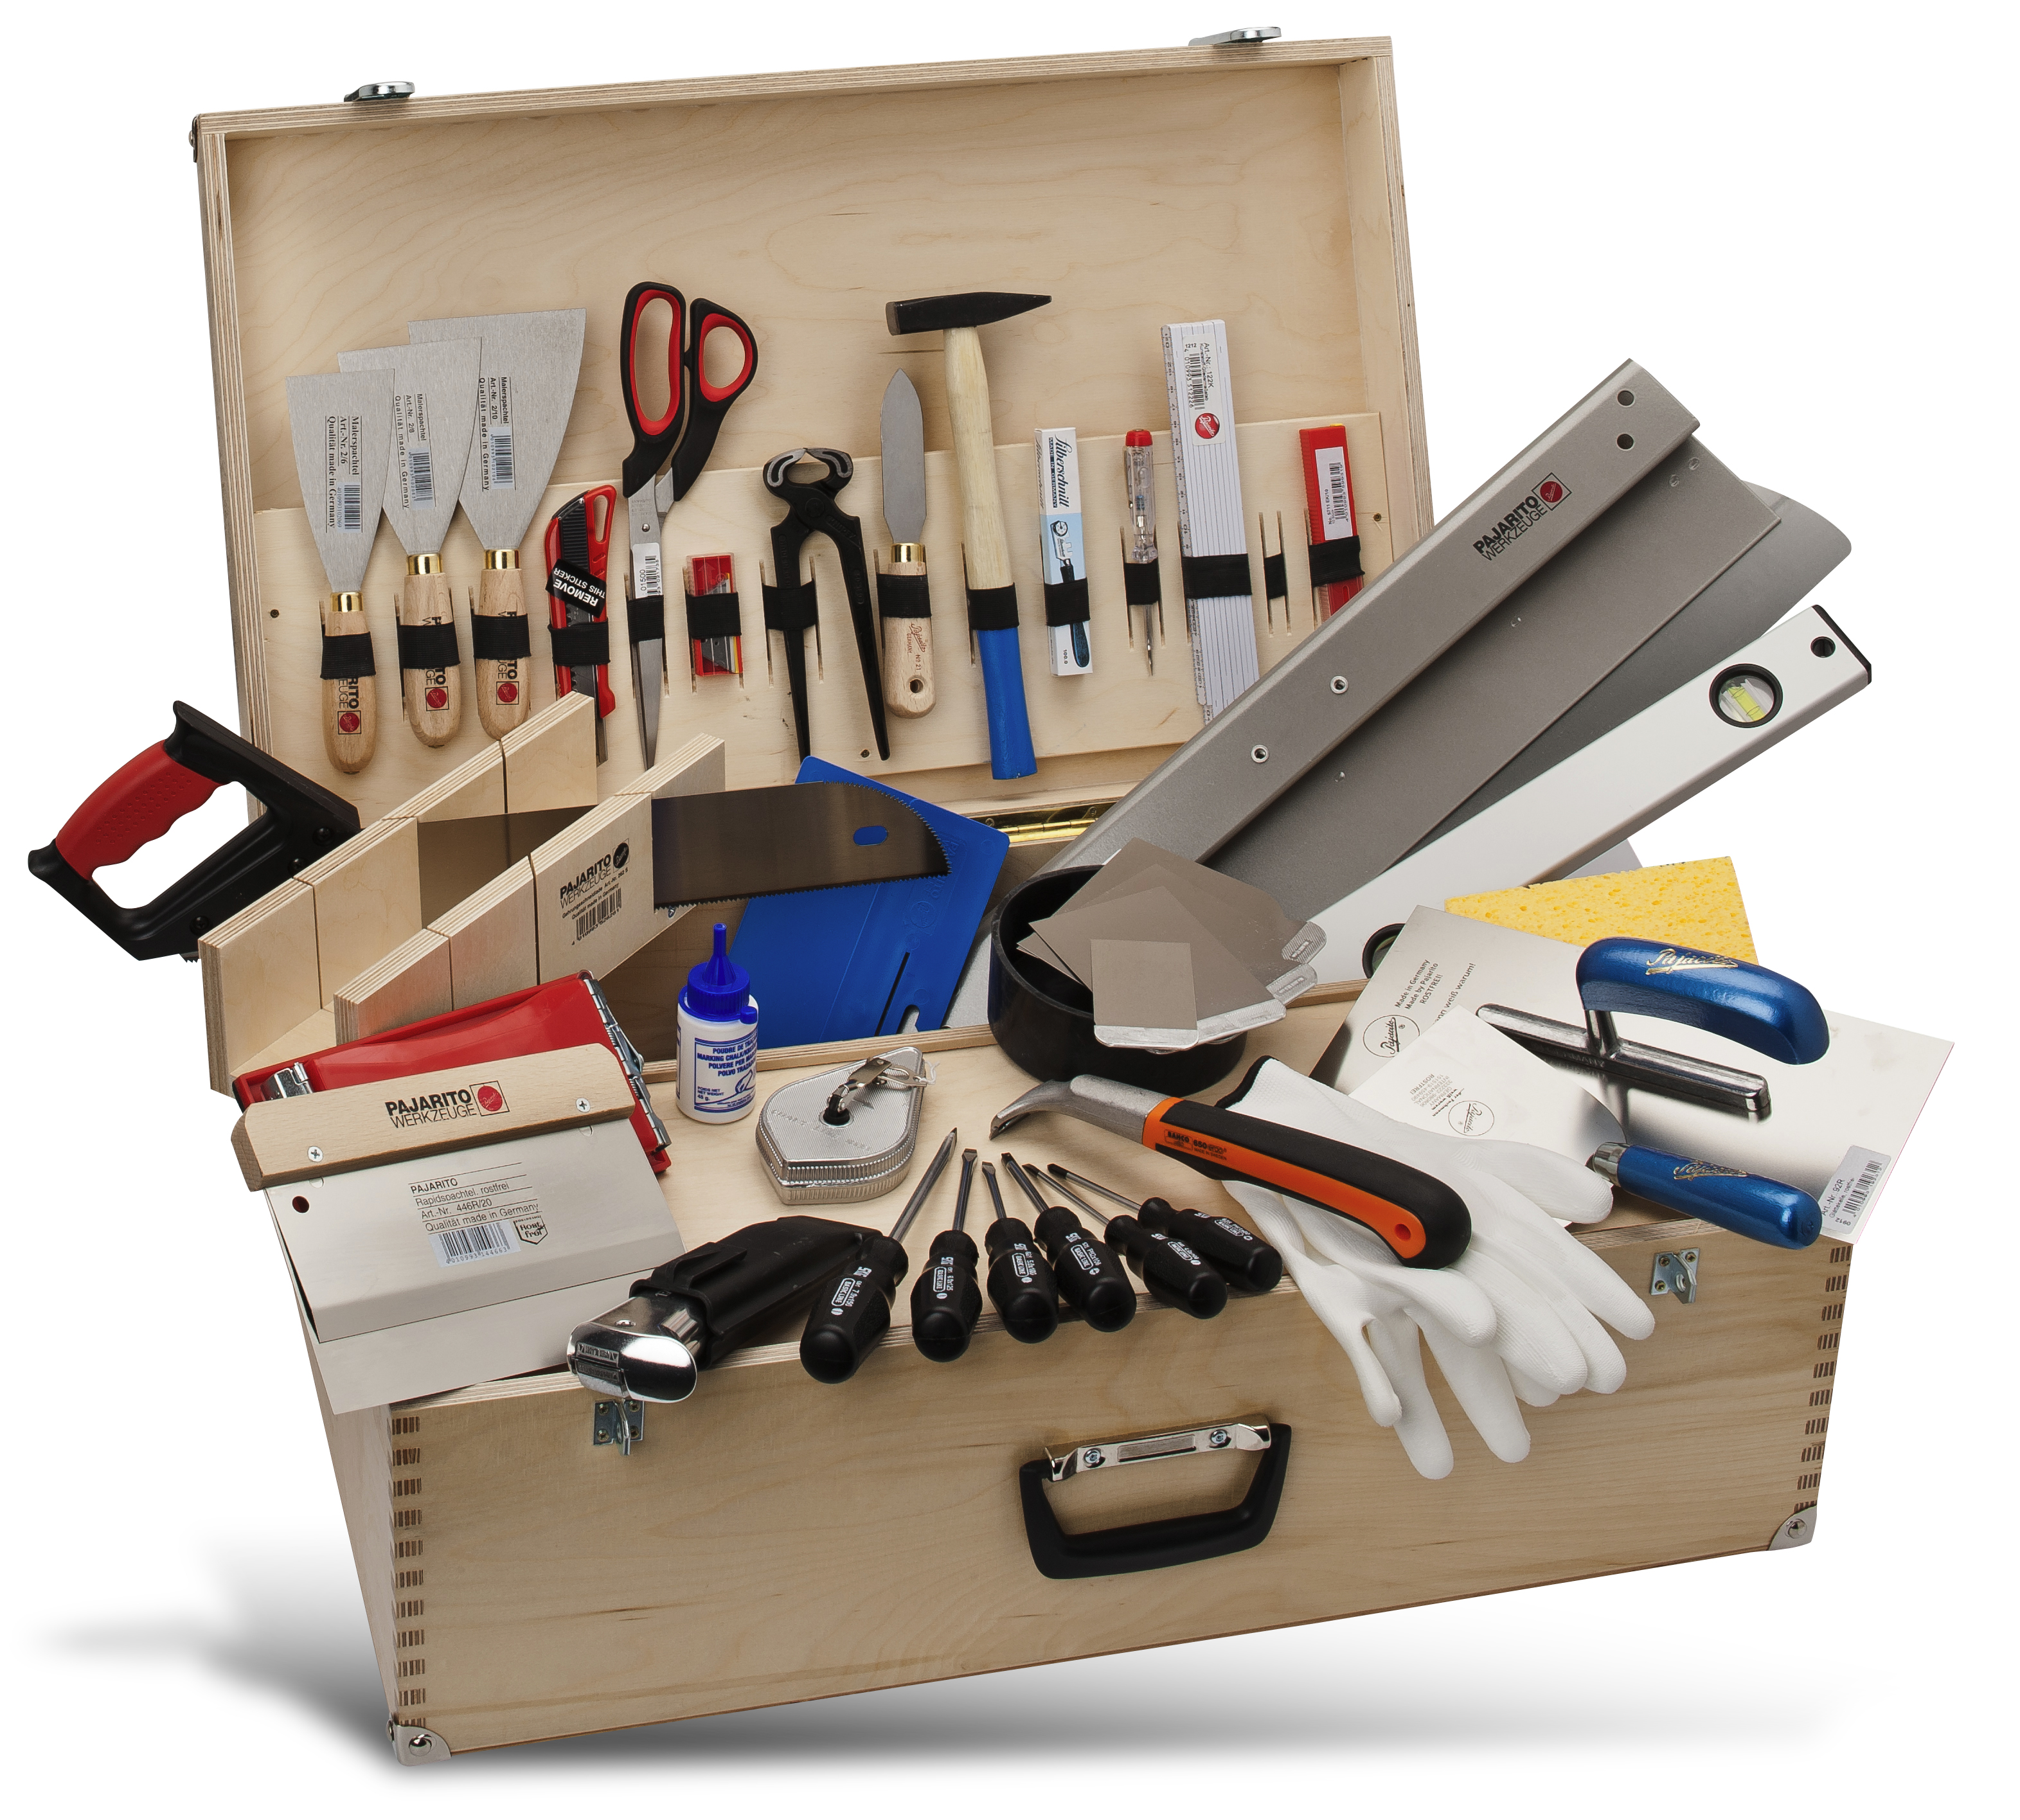 Tool box for painters and decorators Pajarito